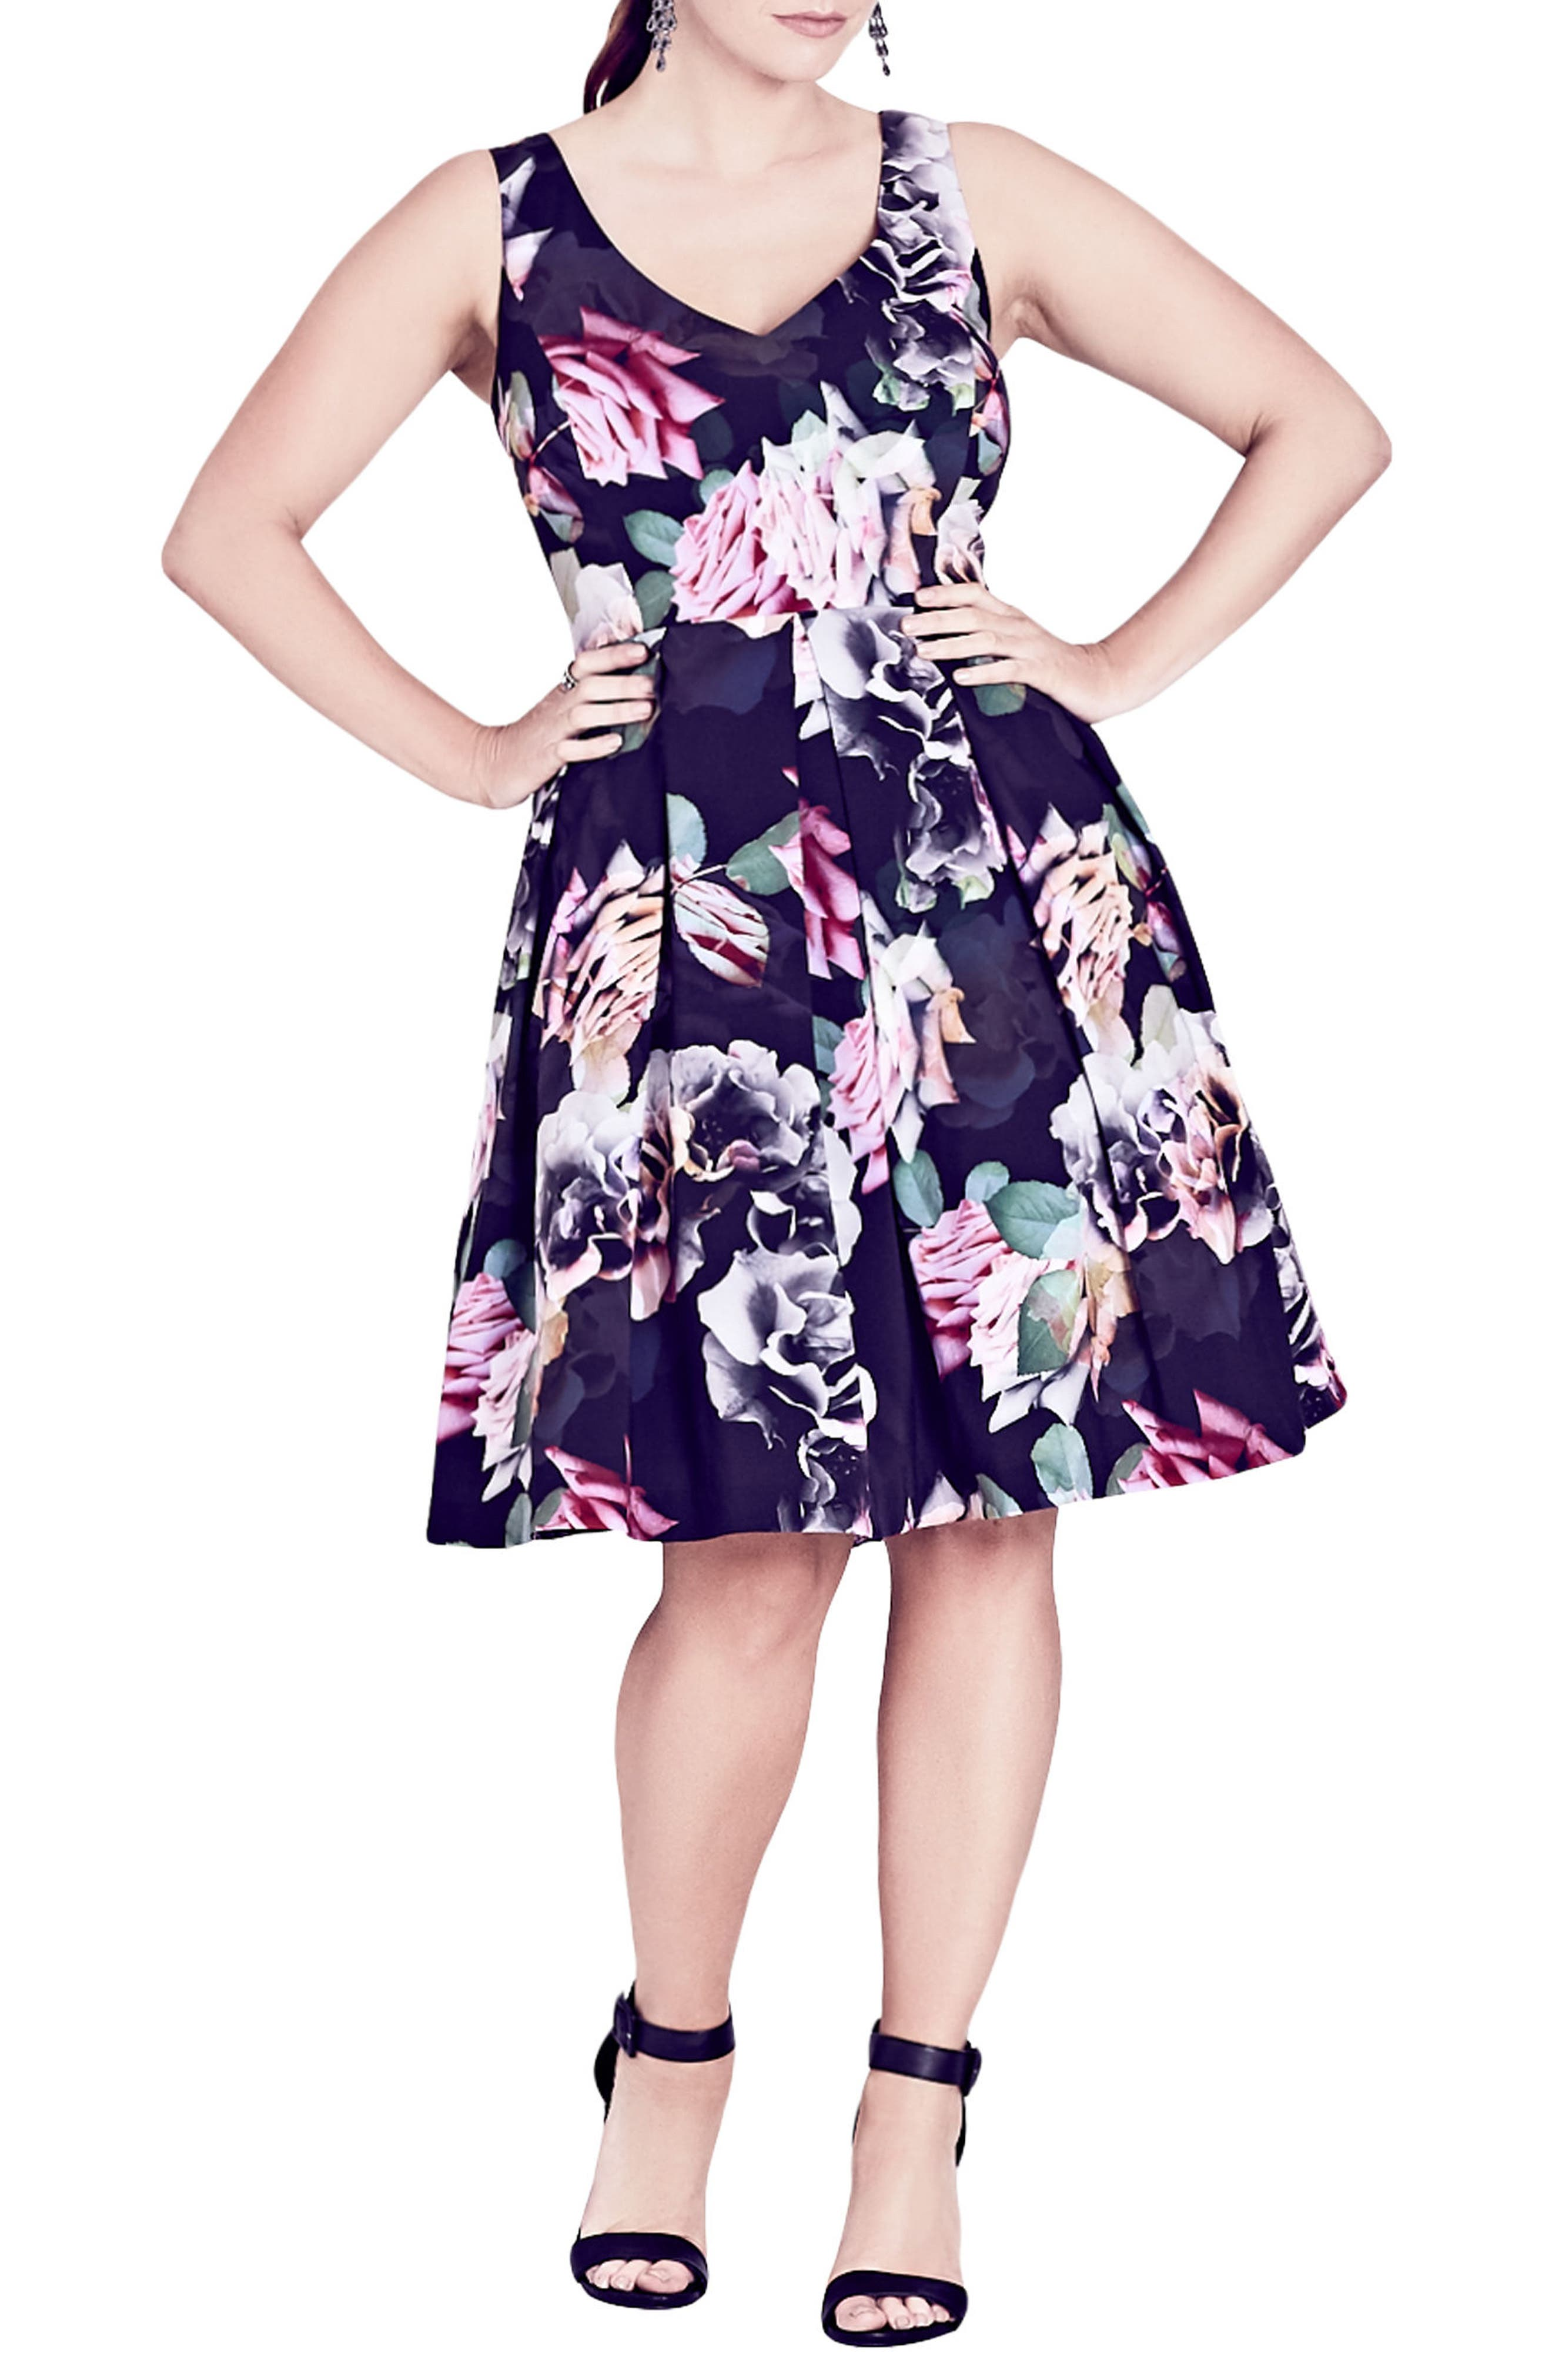 Rose Jewel Fit & Flare Dress,                             Main thumbnail 1, color,                             001